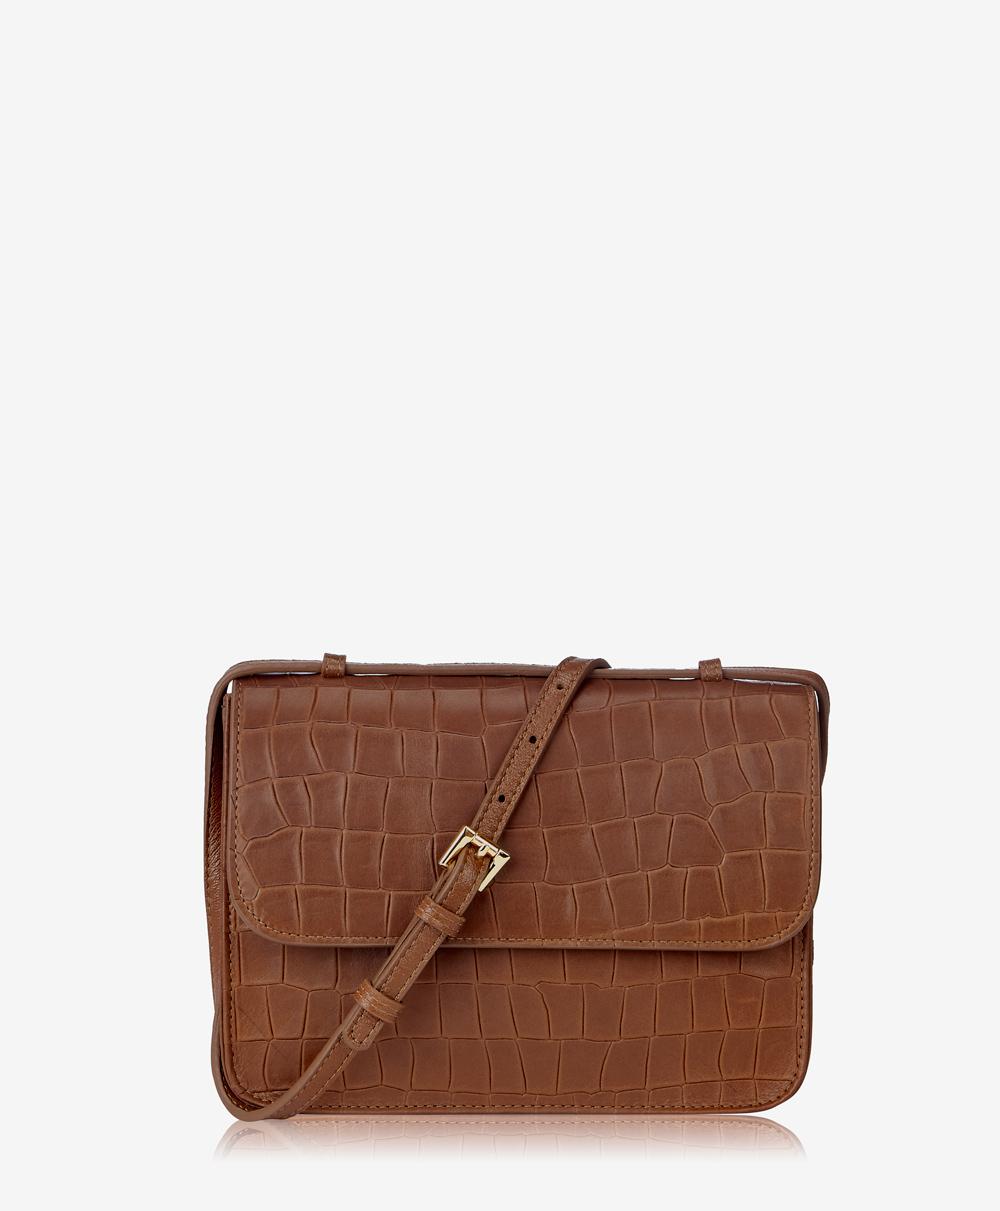 Abbot Crossbody Handbag Brown Embossed Nappa Croco Leather ABT-CRS-BRN